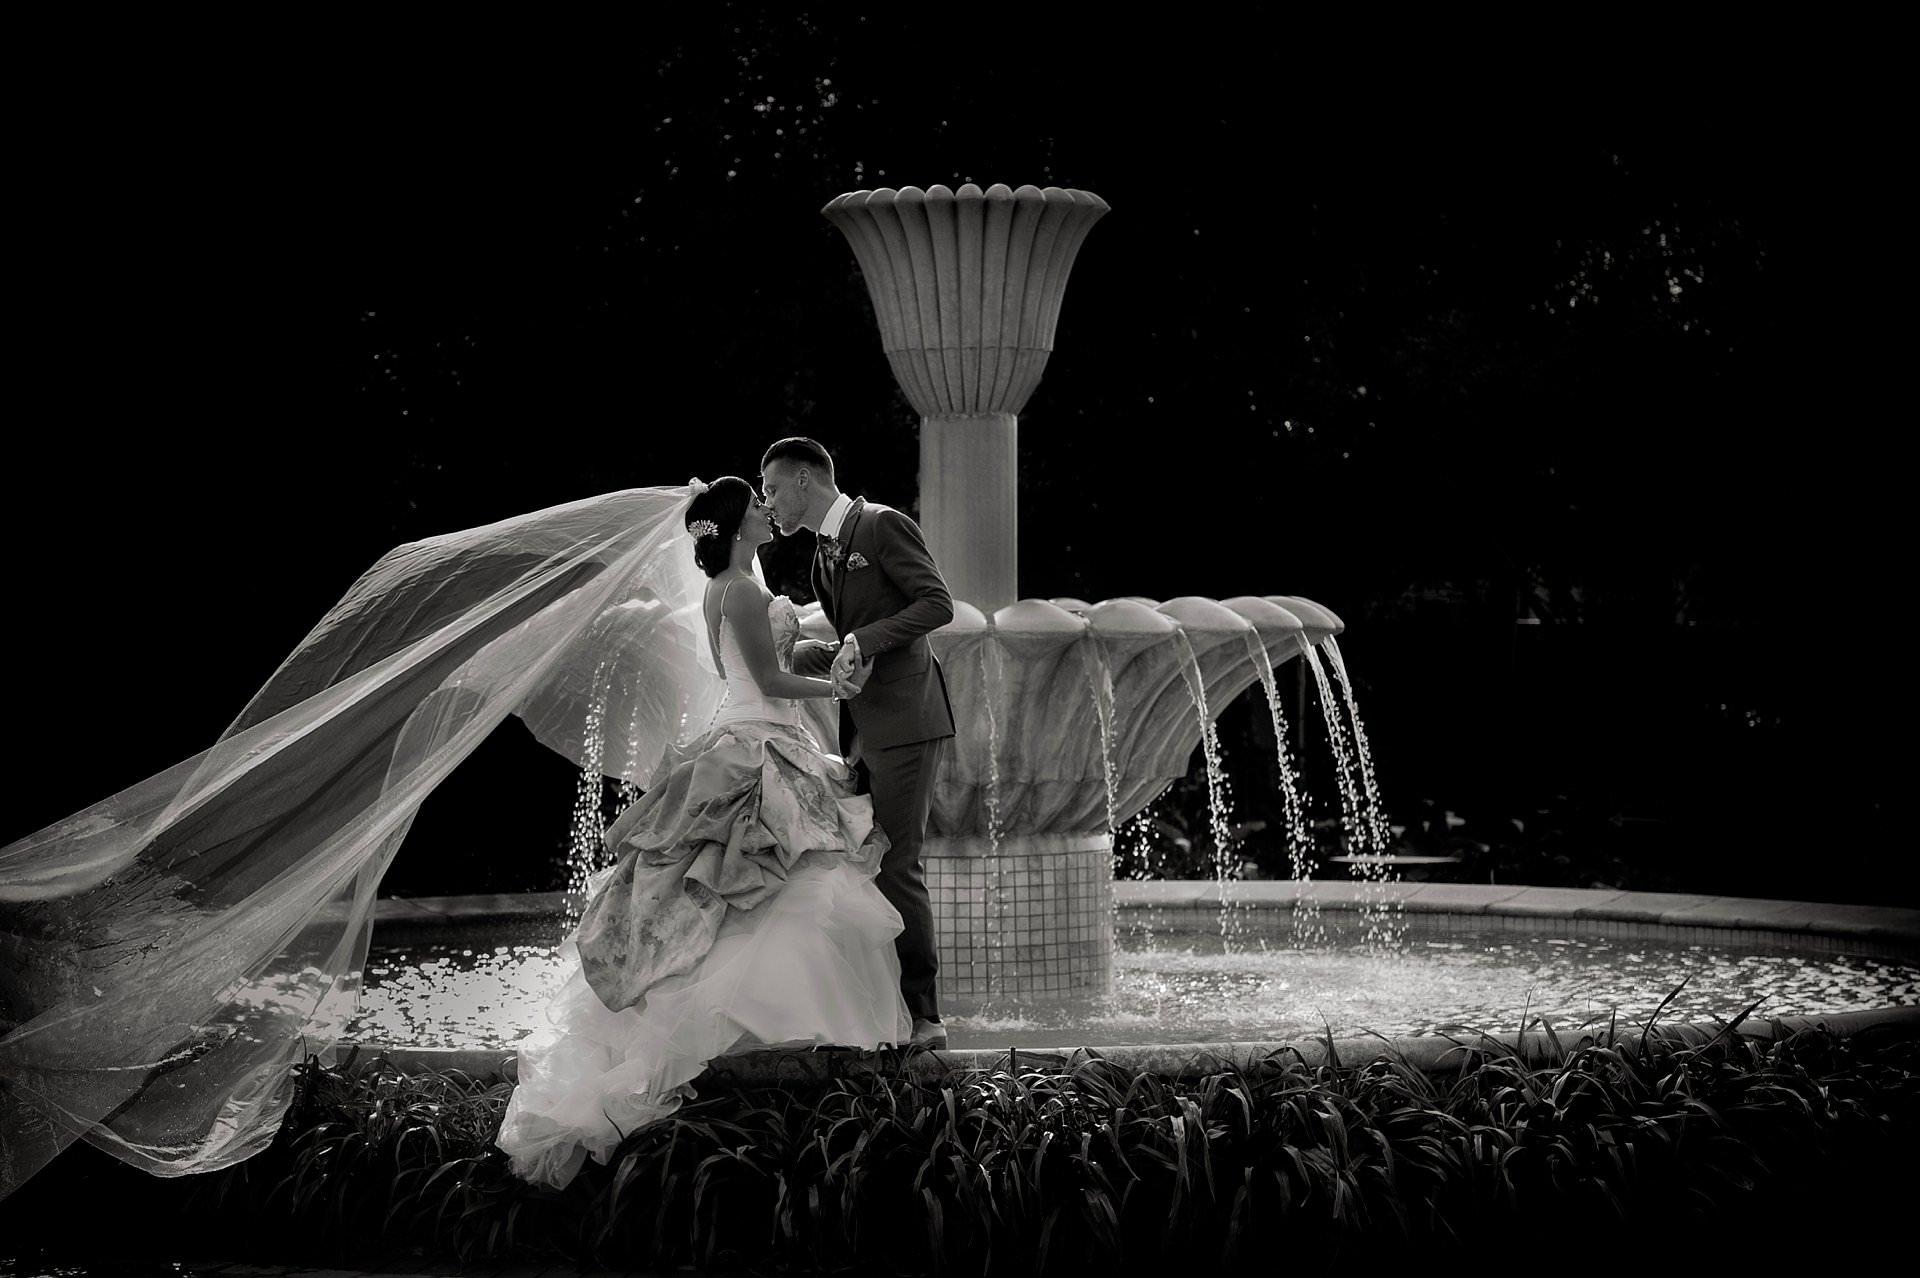 Backyard-Johannesburg-Wedding-Top-South-African-Wedding-Photographers-Jacki-Bruniquel-041